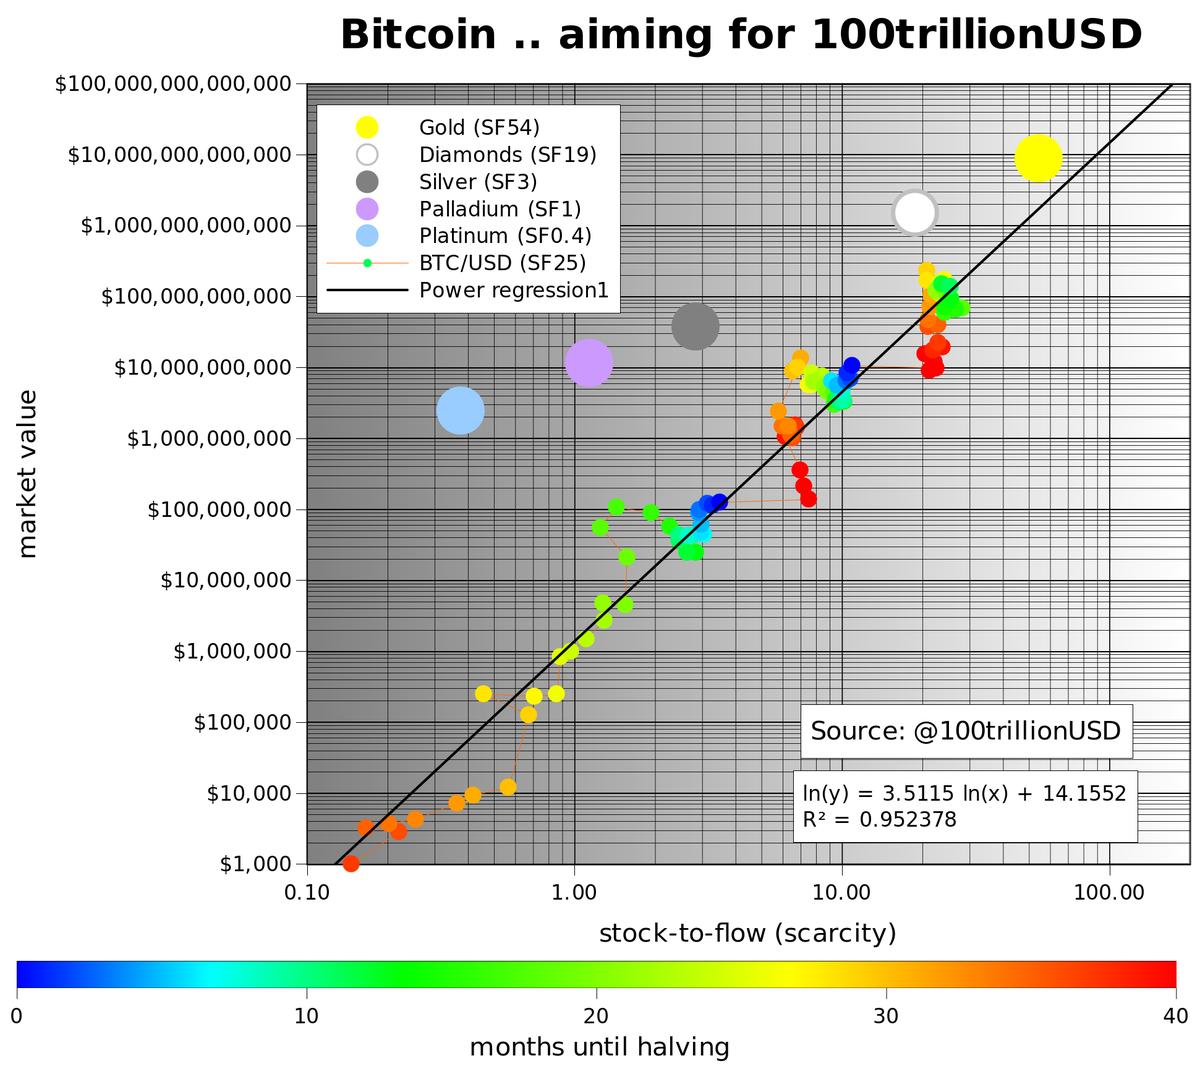 value of bitcoin stock